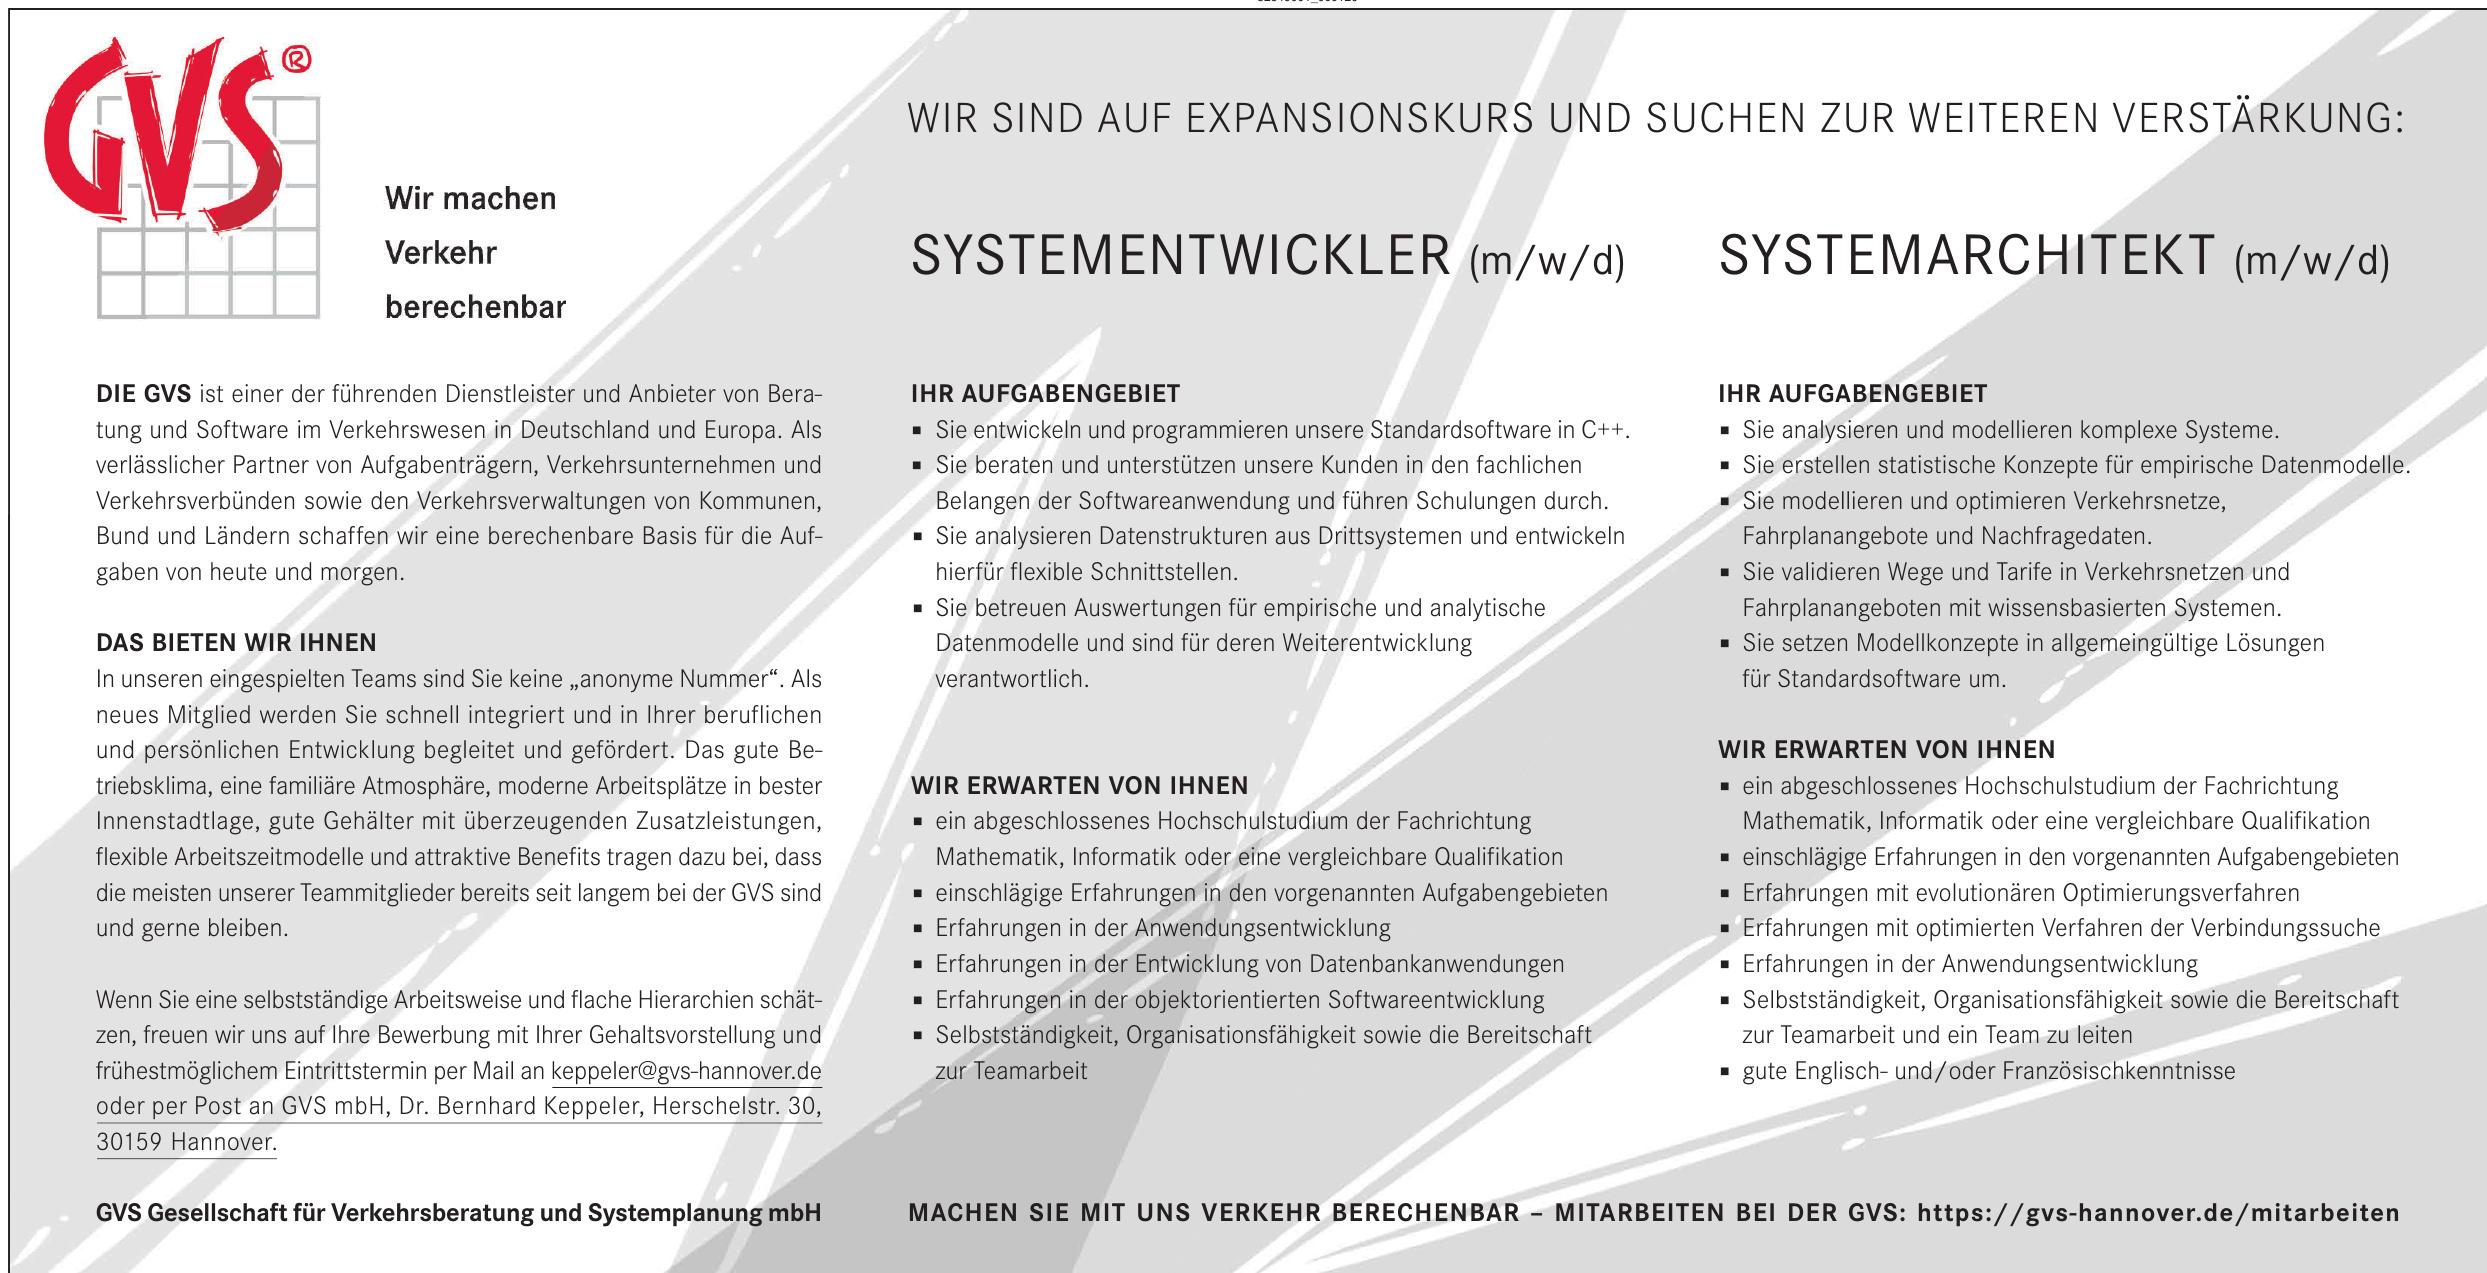 GVS Gesellschaft für Verkehrsberatung und Systemplanung mbH